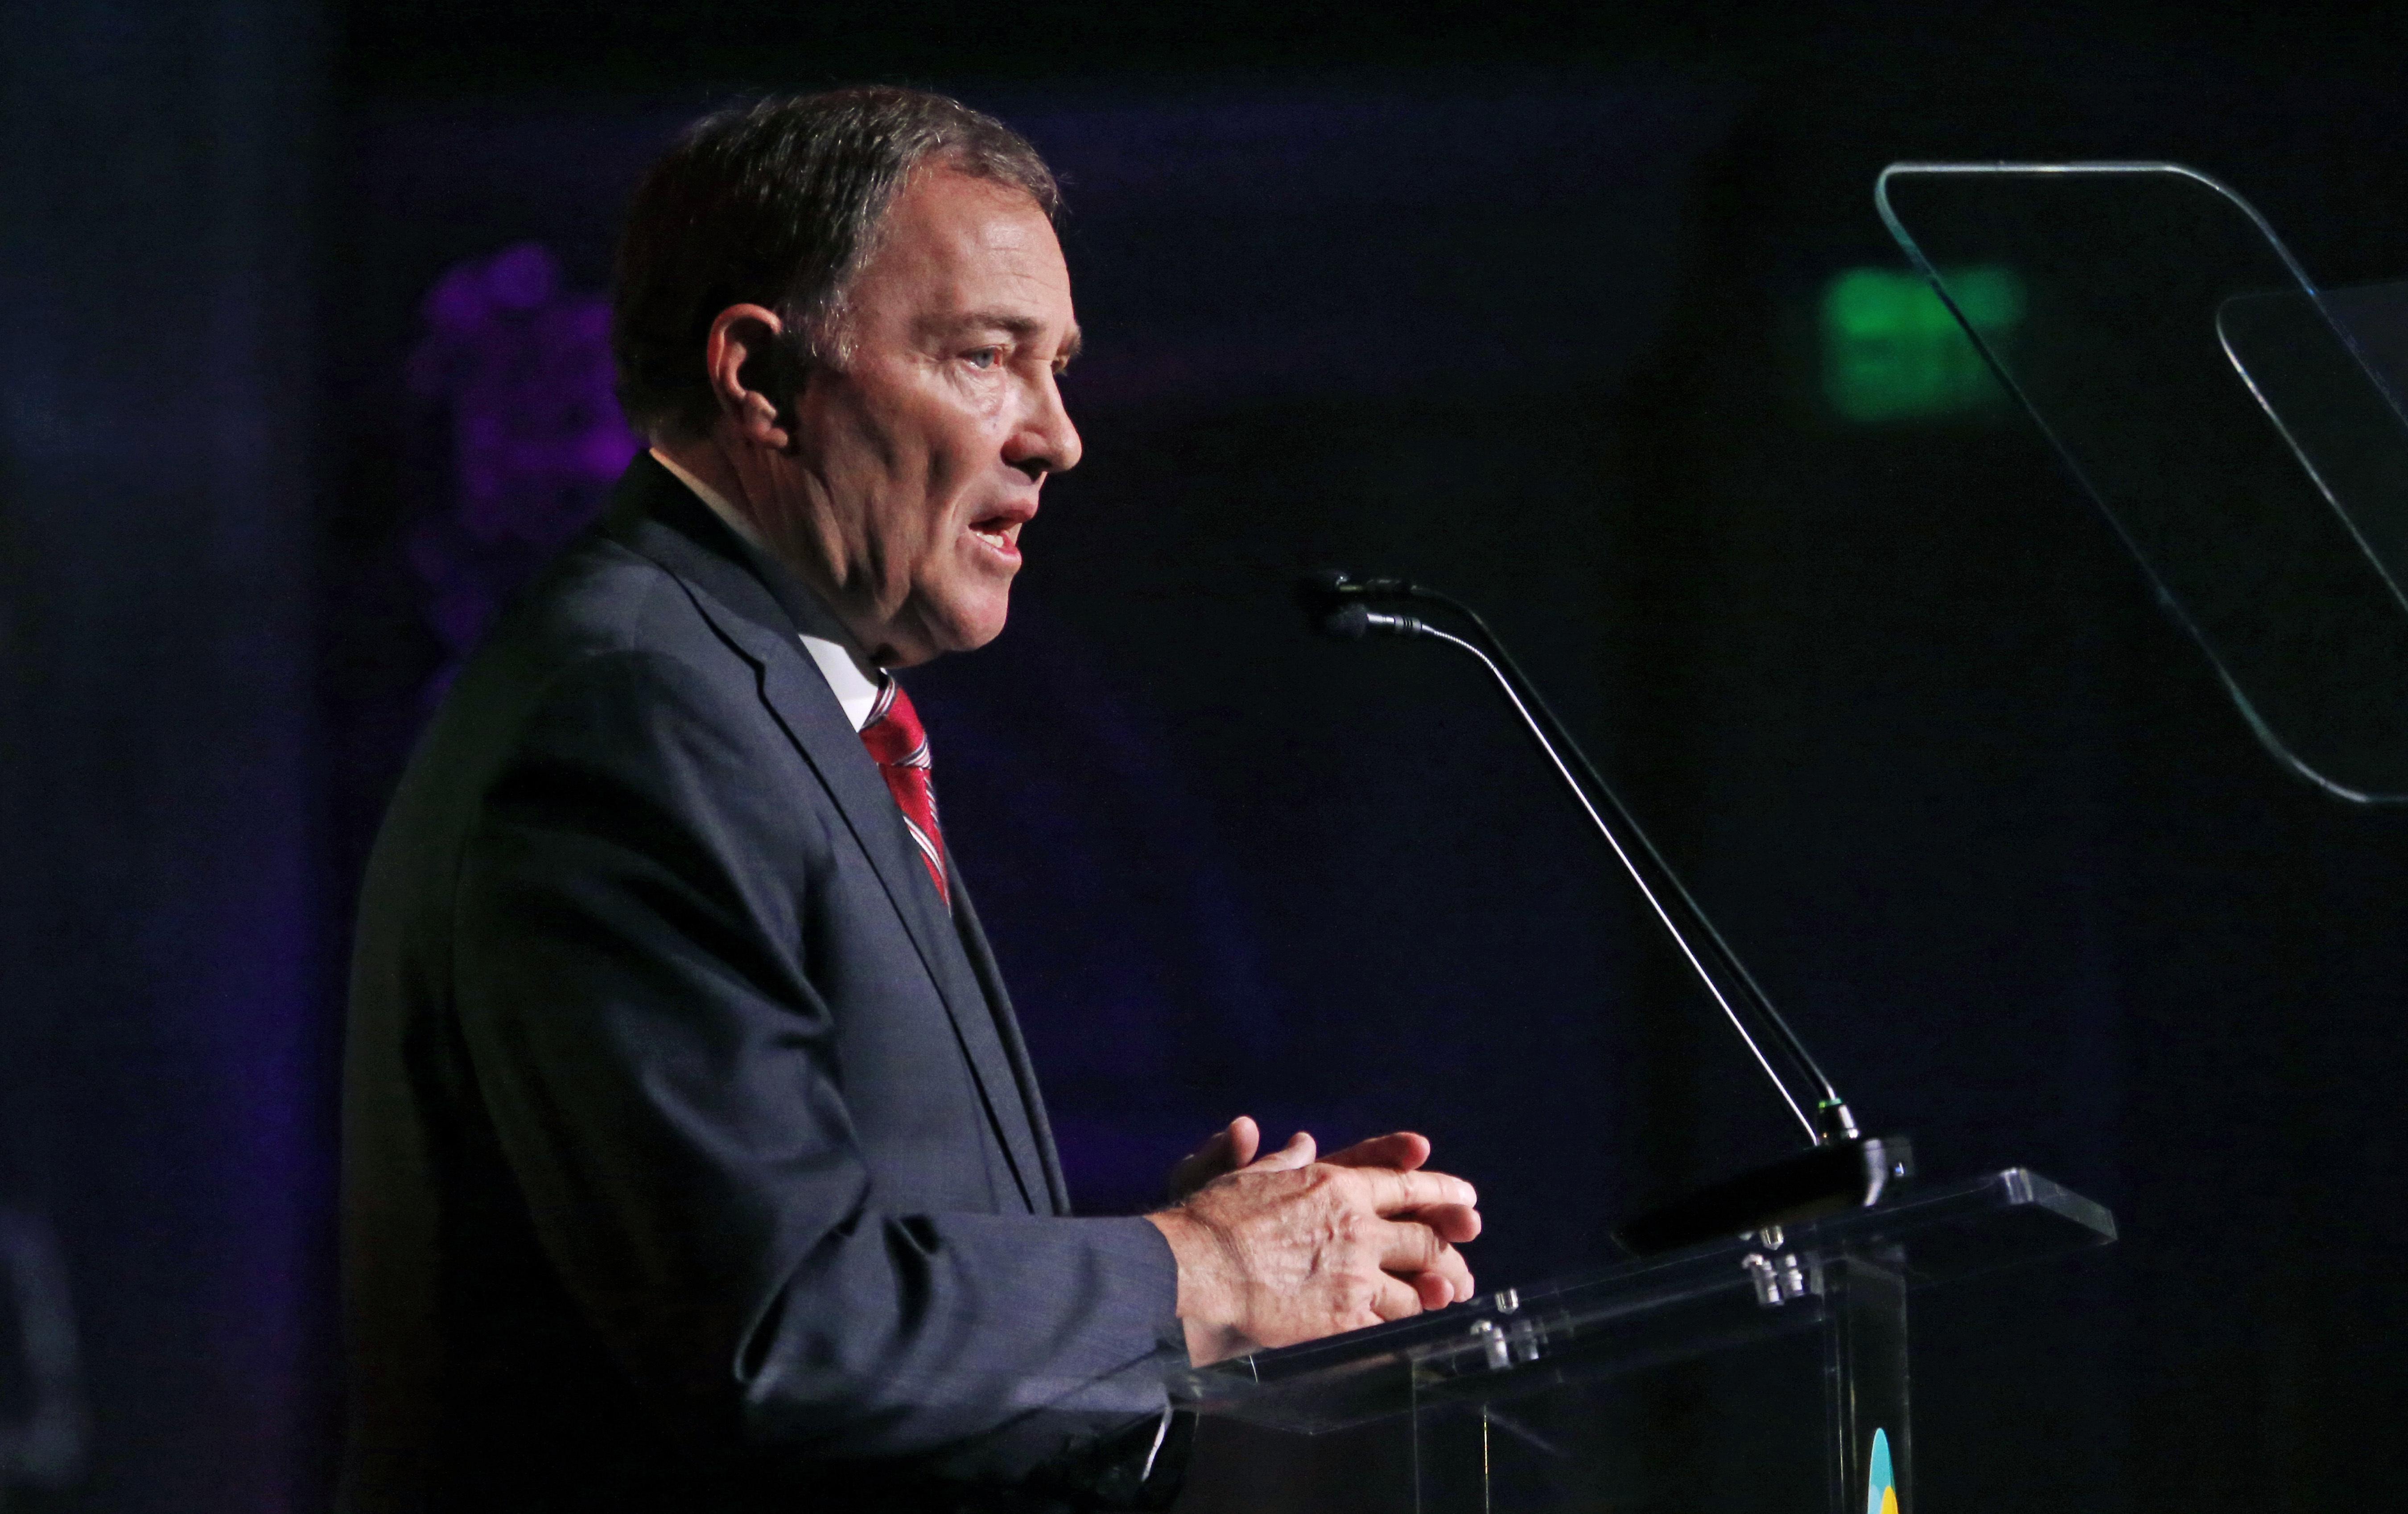 Utah Gov. Gary Herbert speaks during a conference in Salt Lake City.